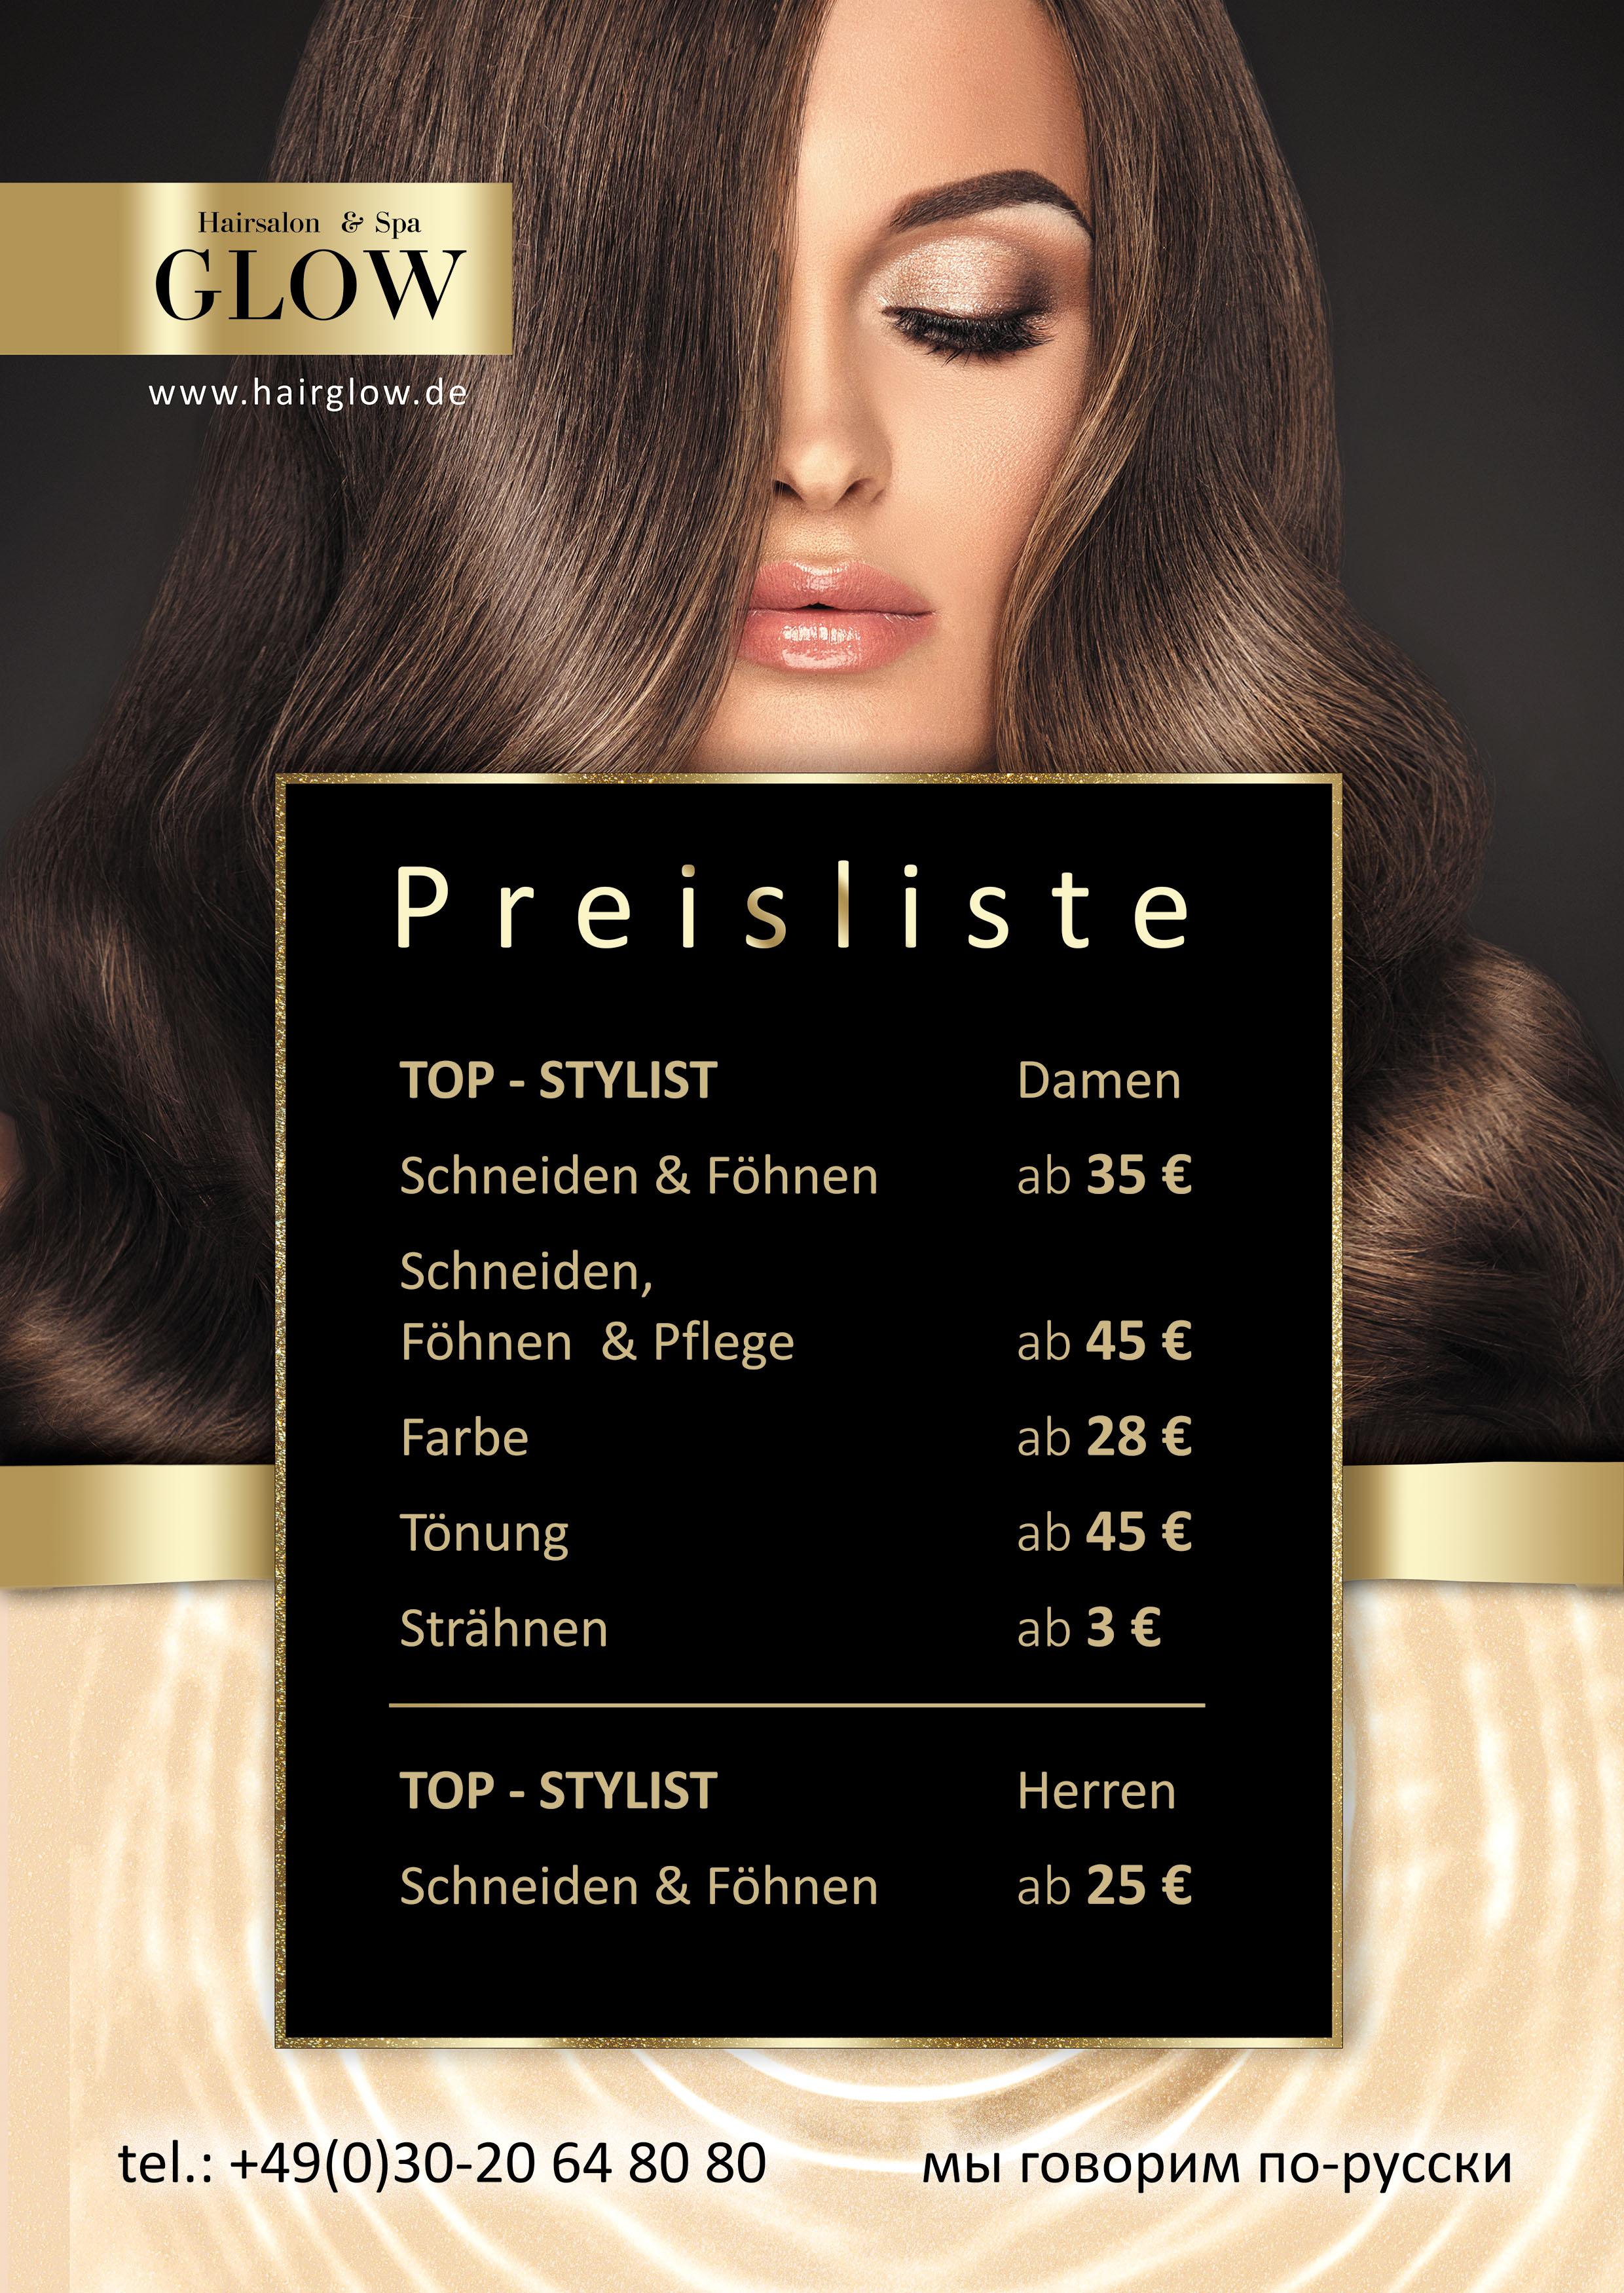 GLOW HAIR SALON & SPA - салон красоты в Берлине